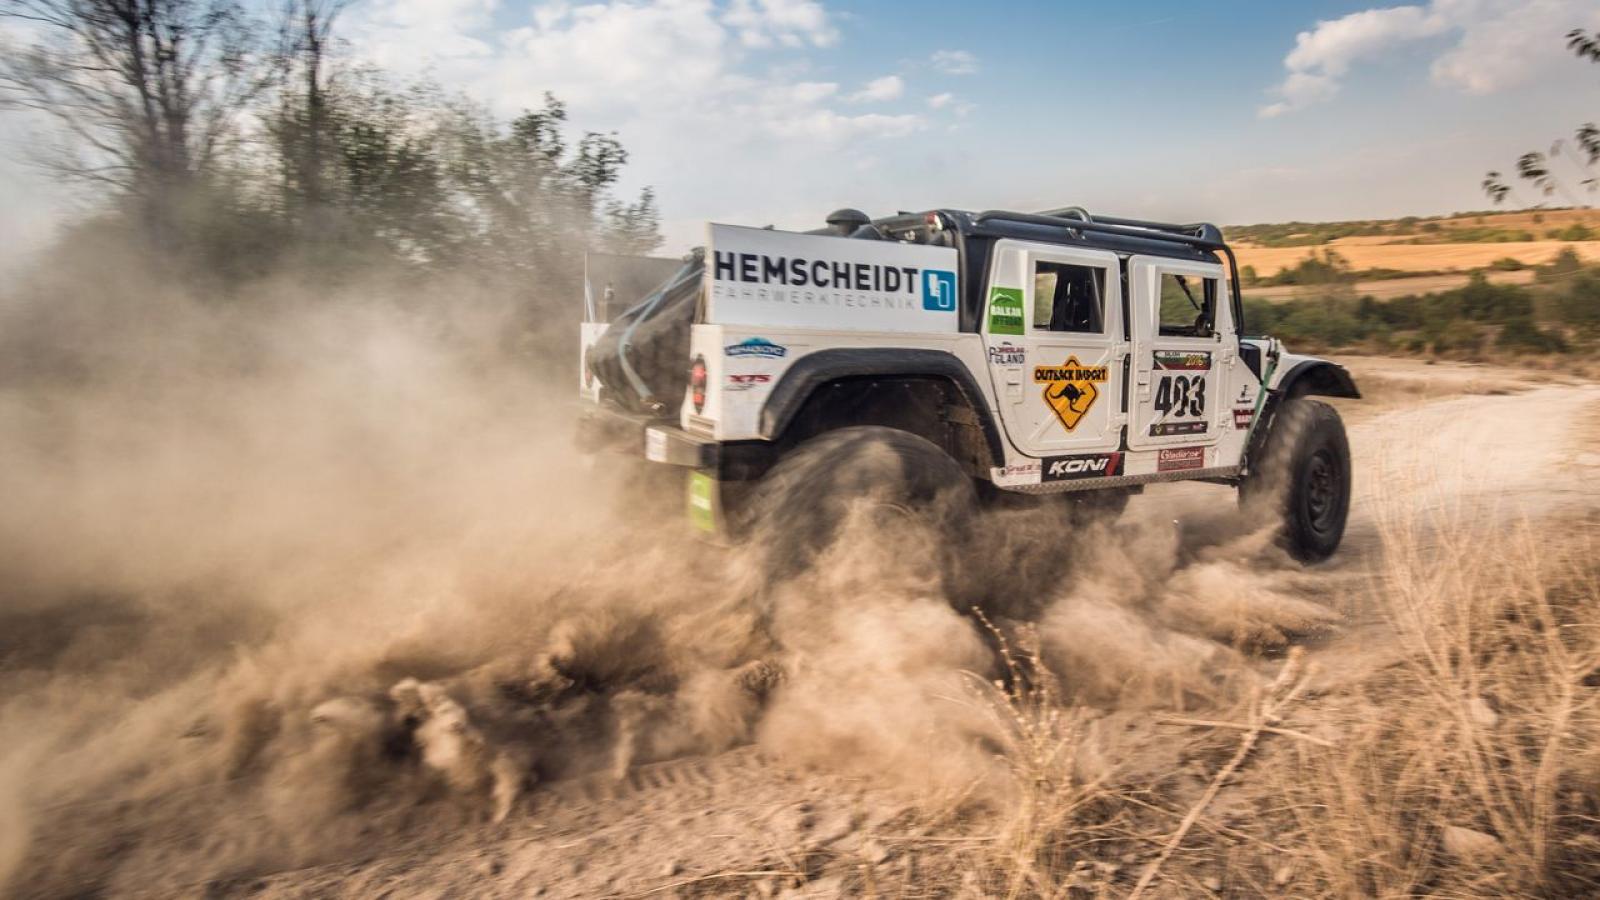 Mercedes Benz Unimog Hummer H1 Rally Truck - 4